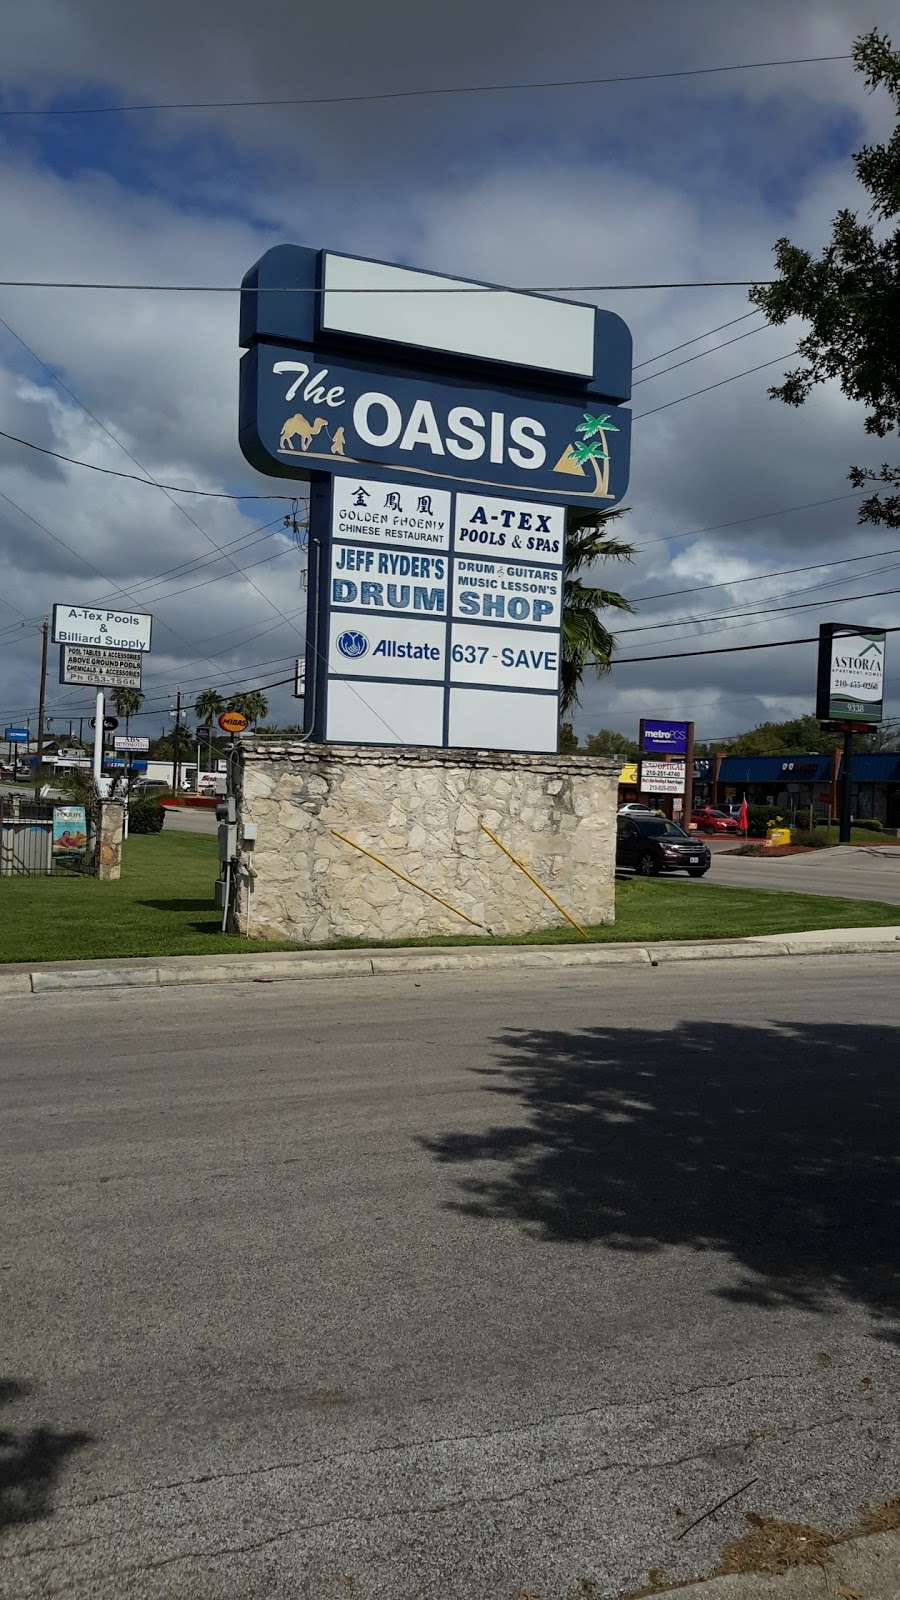 A+ Foot Spa - spa  | Photo 2 of 10 | Address: 9323 Perrin Beitel Rd #104, San Antonio, TX 78217, USA | Phone: (210) 590-1221